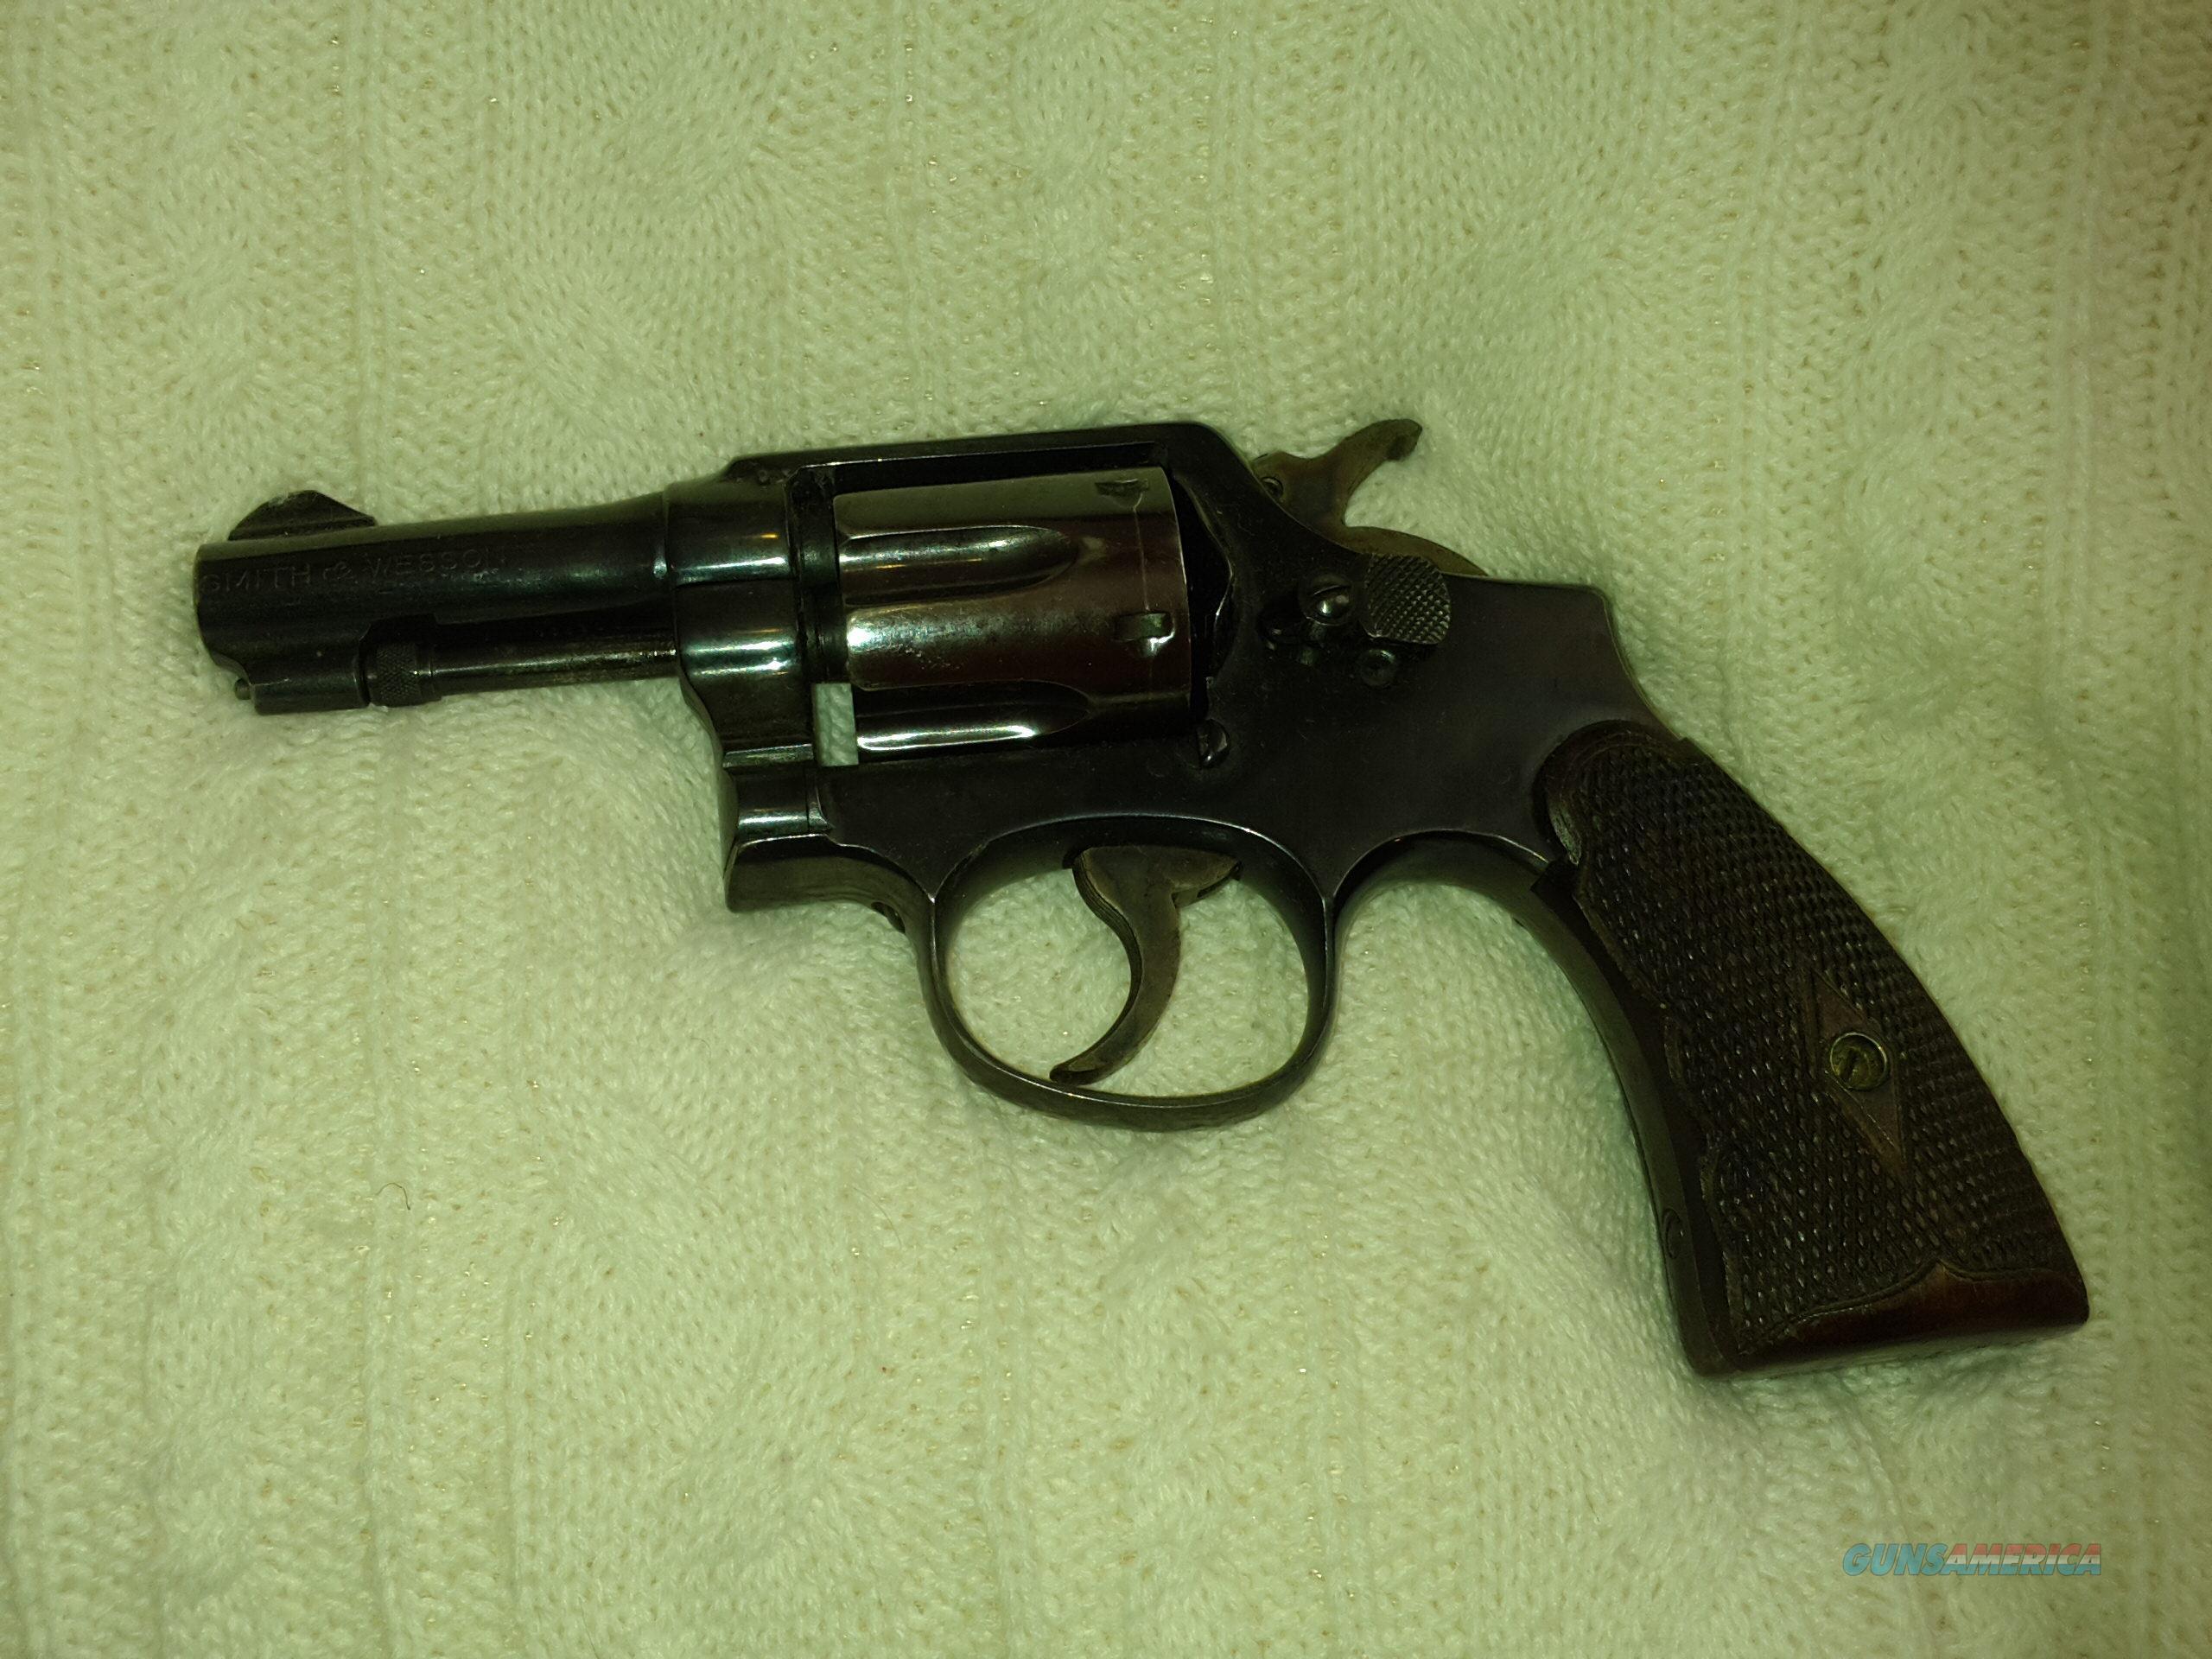 38 cal s w revolver used victory 10 model for sale. Black Bedroom Furniture Sets. Home Design Ideas